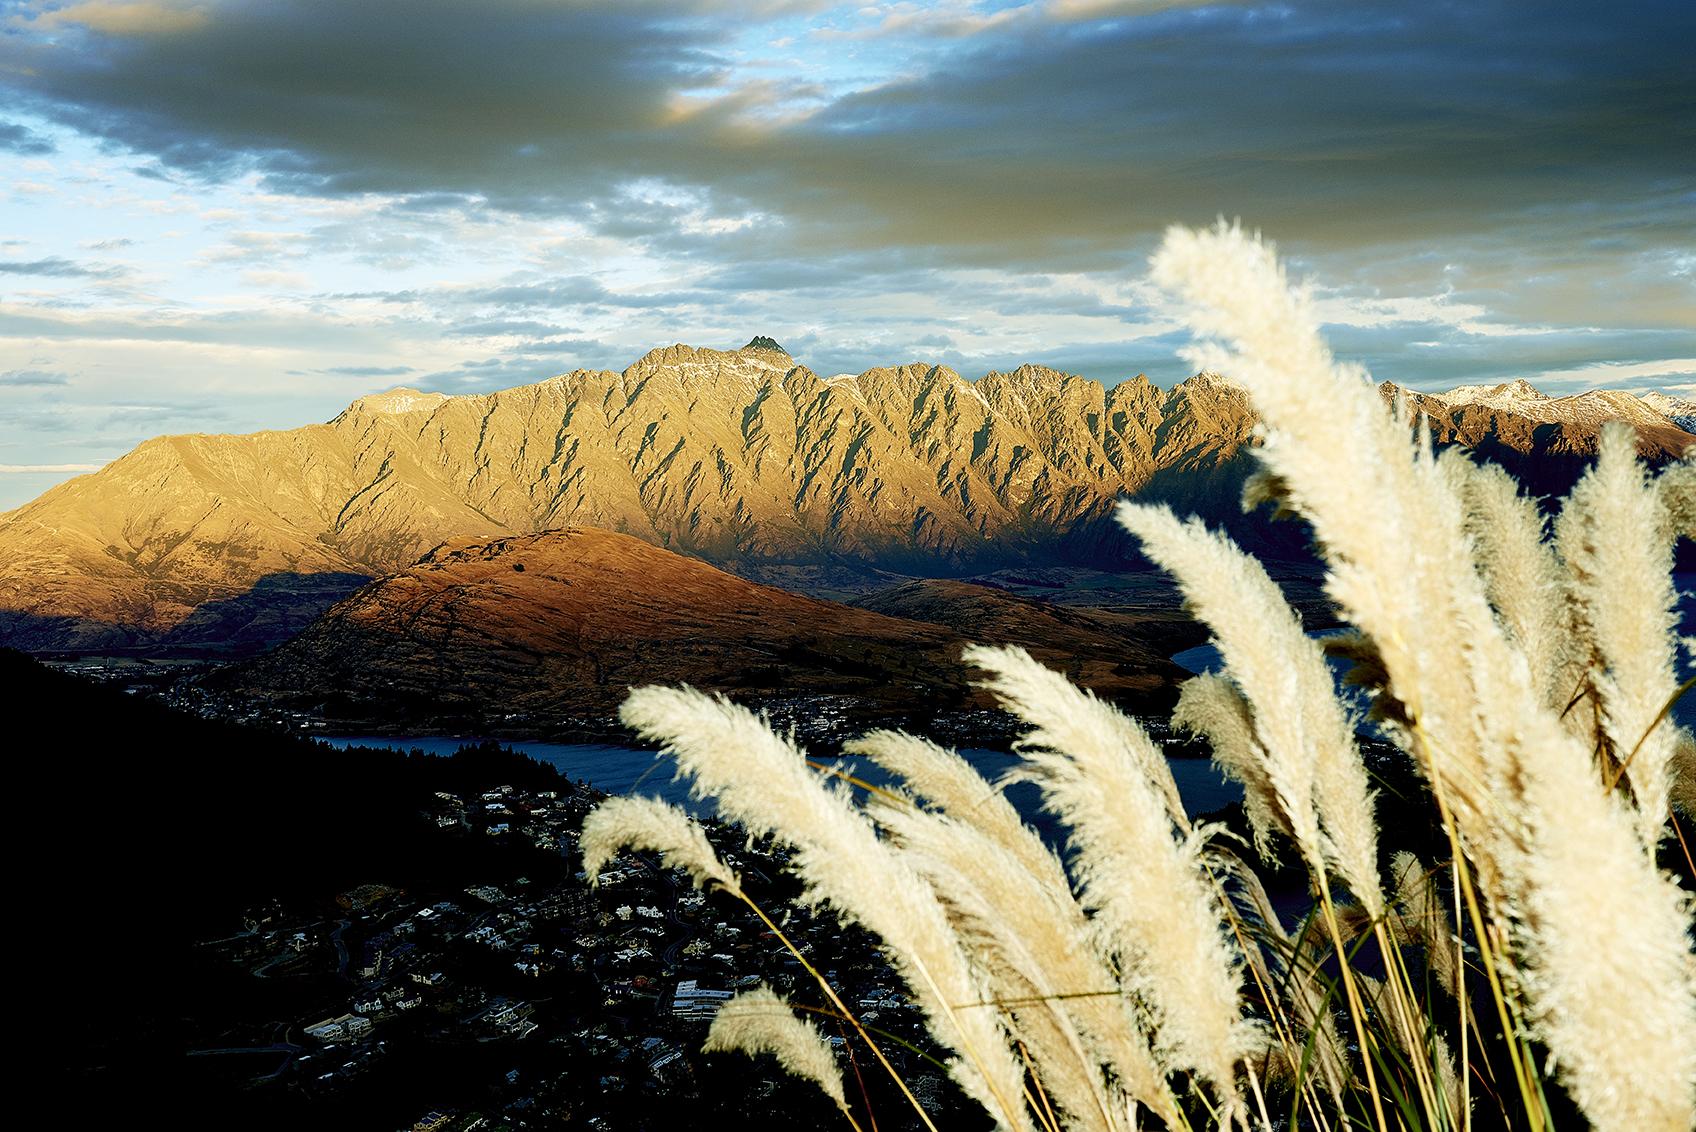 New-Zealand-Travels-Photography-Mark-Sullivan-Bradley.jpg